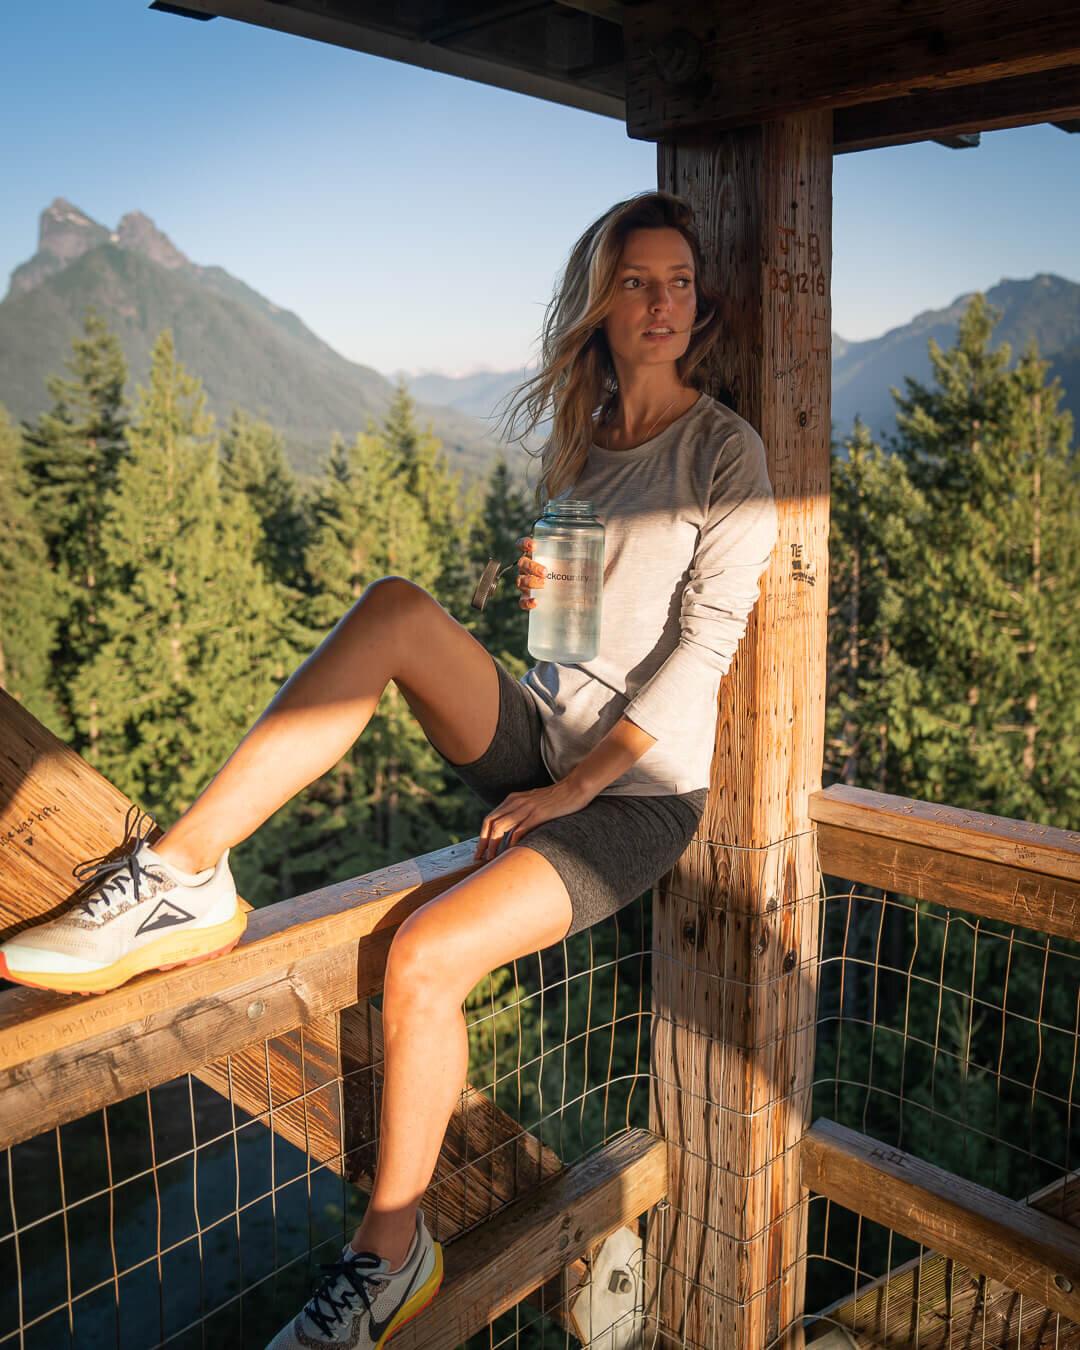 Heybrook Lookout at sunset. Wearing: Nike  Trail Running Shoes , Beyond Yoga  Biker Shorts , The North Face  HyperLayer Long Sleeve , Nalgene  Water Bottle .